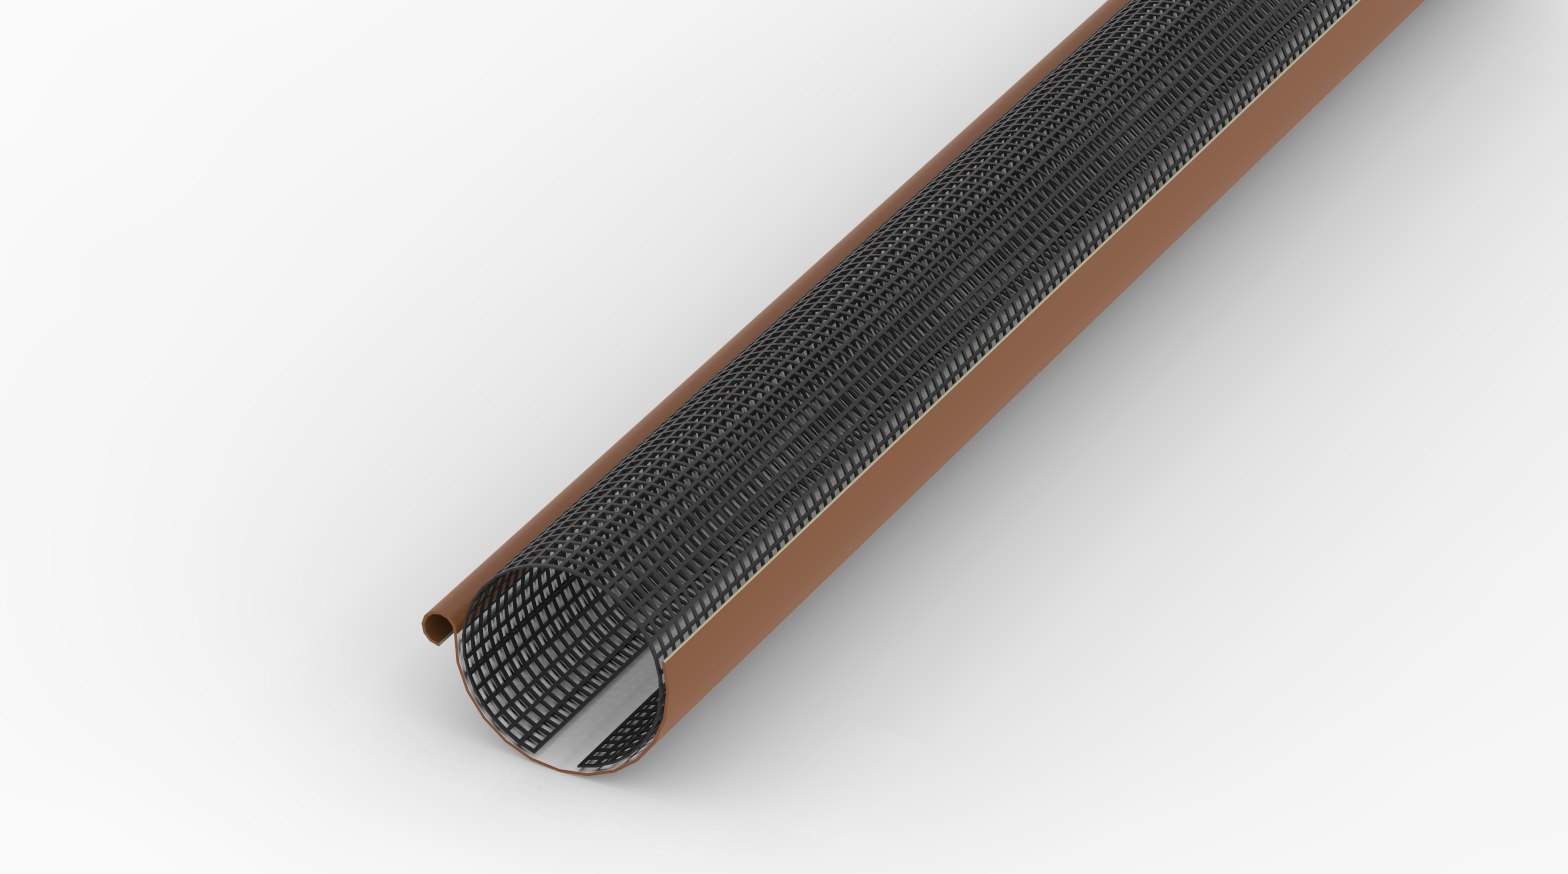 laubschutzgitter 2m lang f r dachrinnen 100mm 125mm laubstopp in schwarz ebay. Black Bedroom Furniture Sets. Home Design Ideas